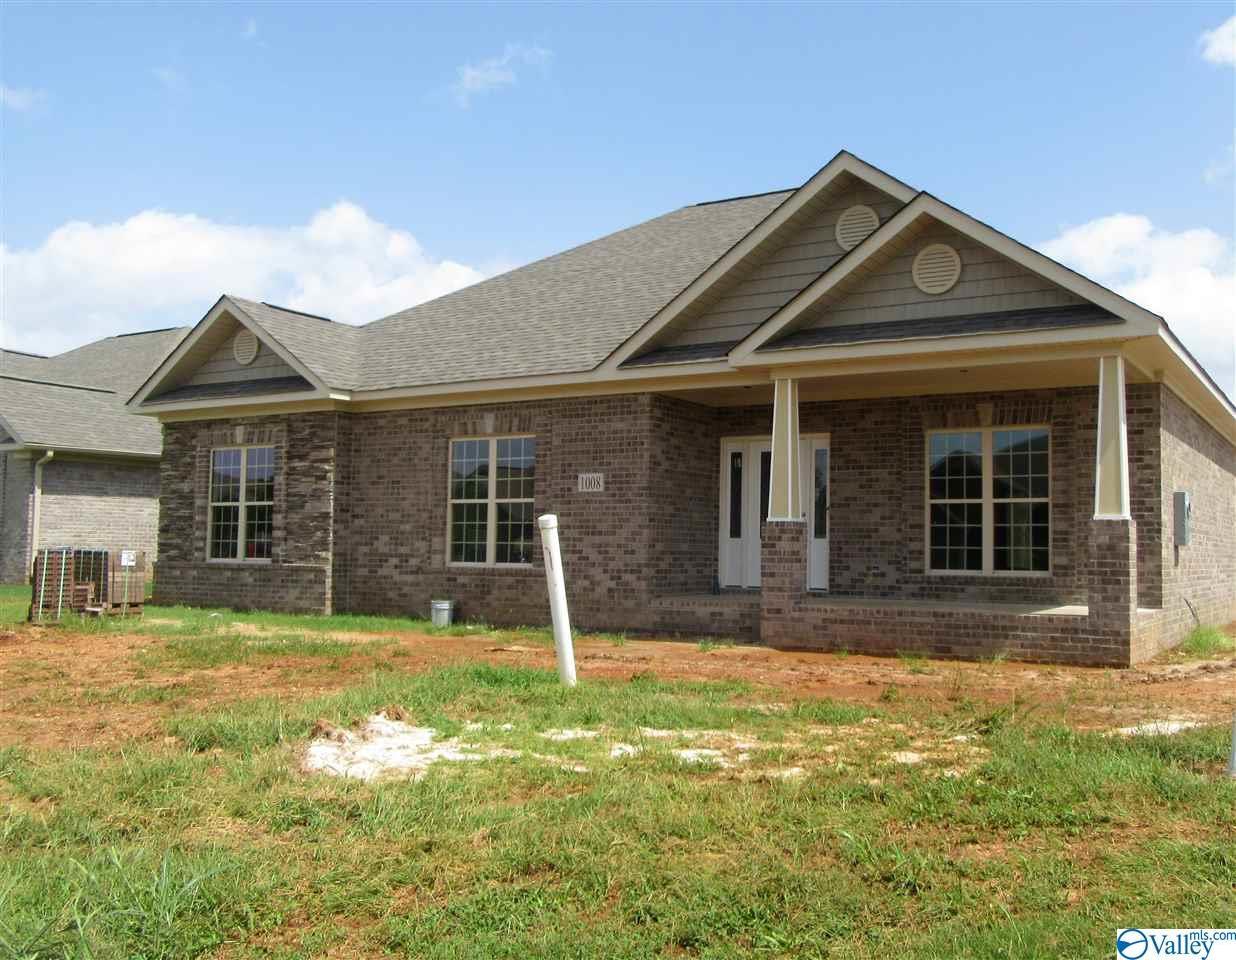 Photo of home for sale at 1008 Worton Grange, Decatur AL